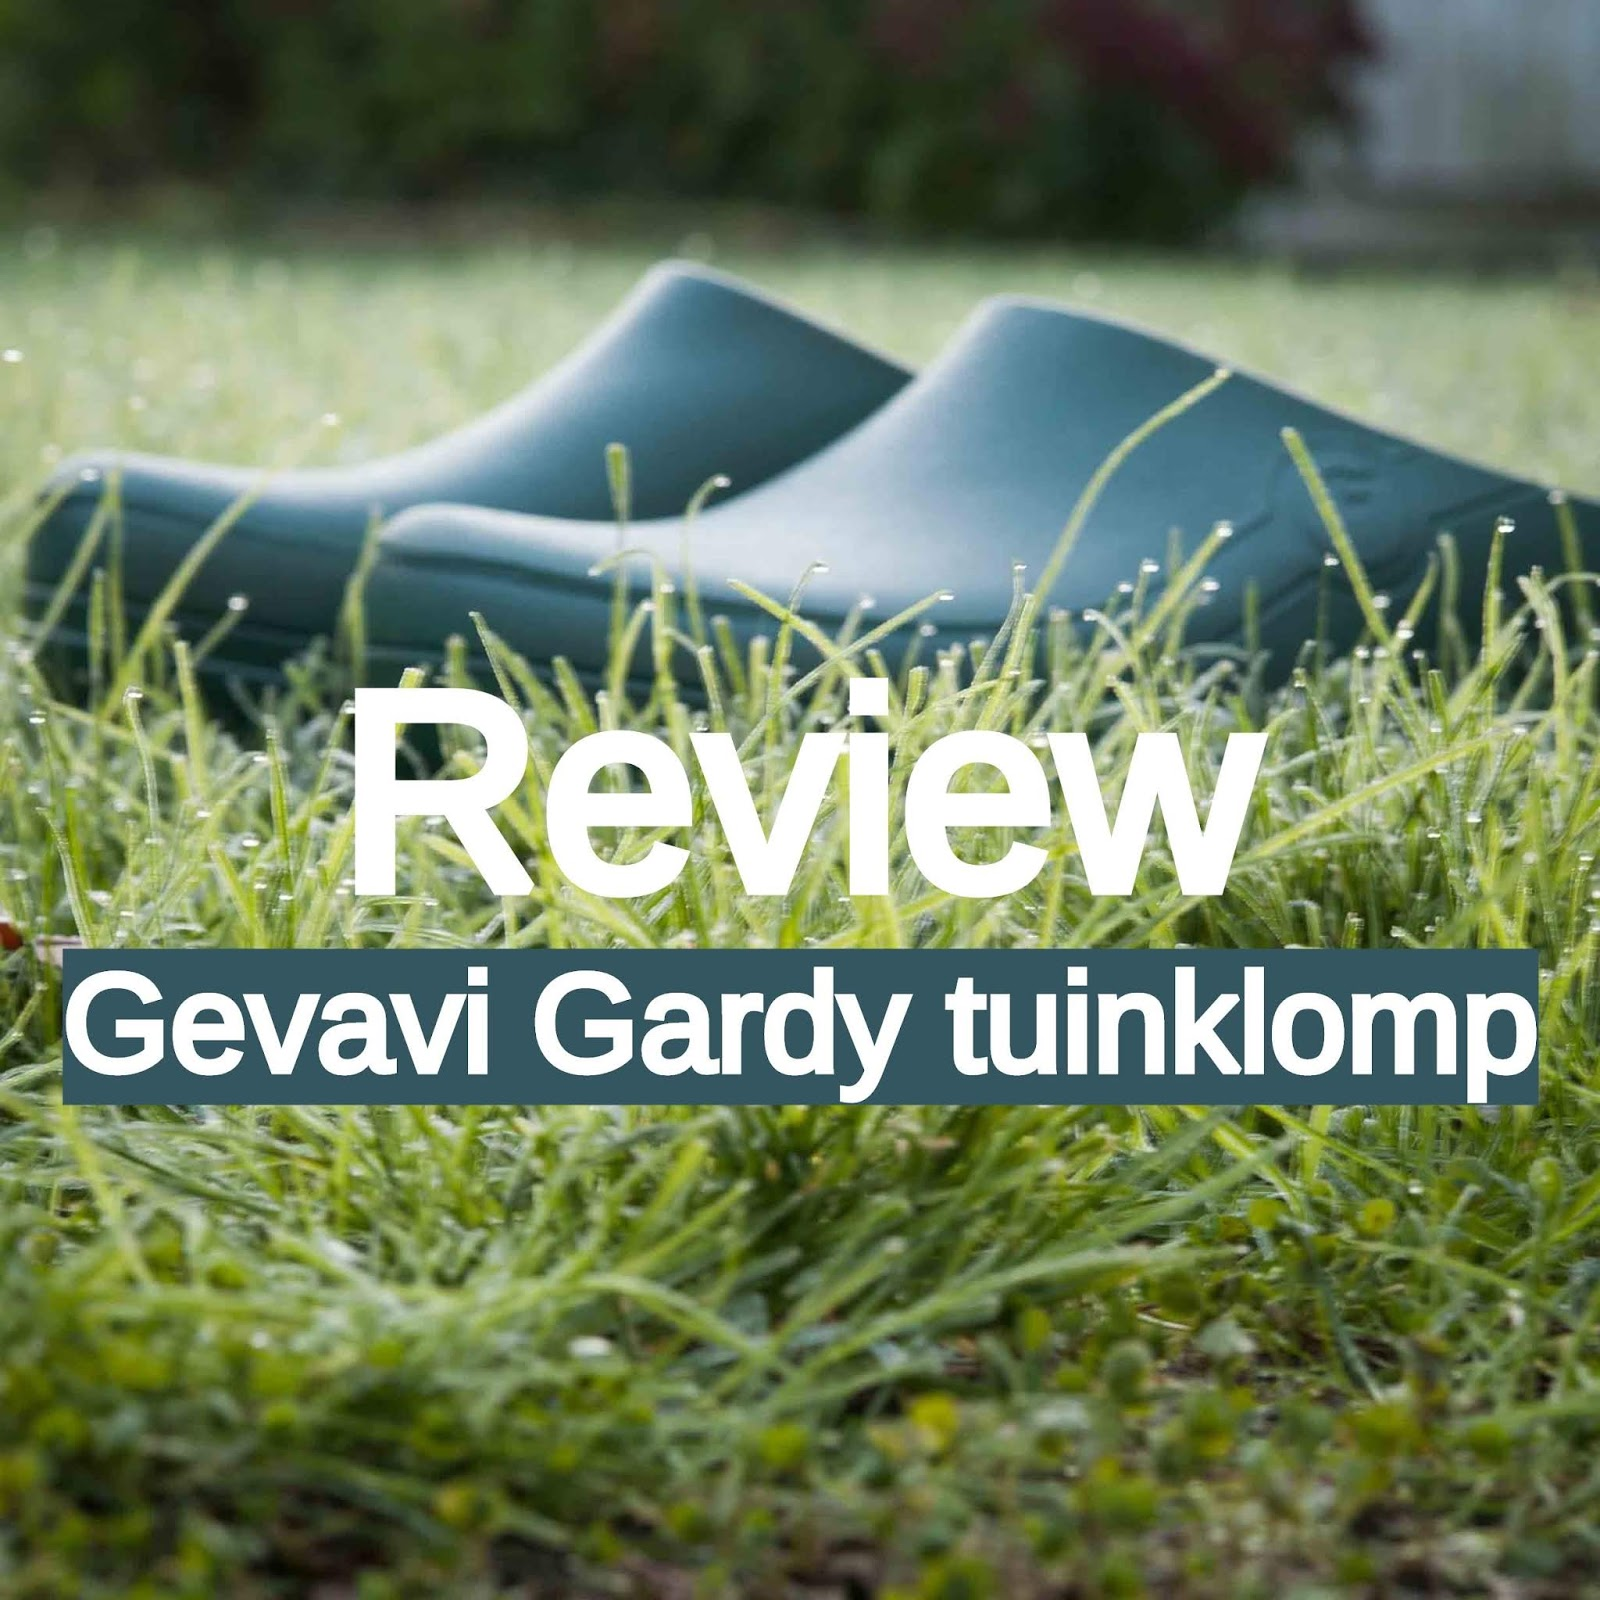 Gevavi tuinklomp klomp Gardy review volkstuin moestuin